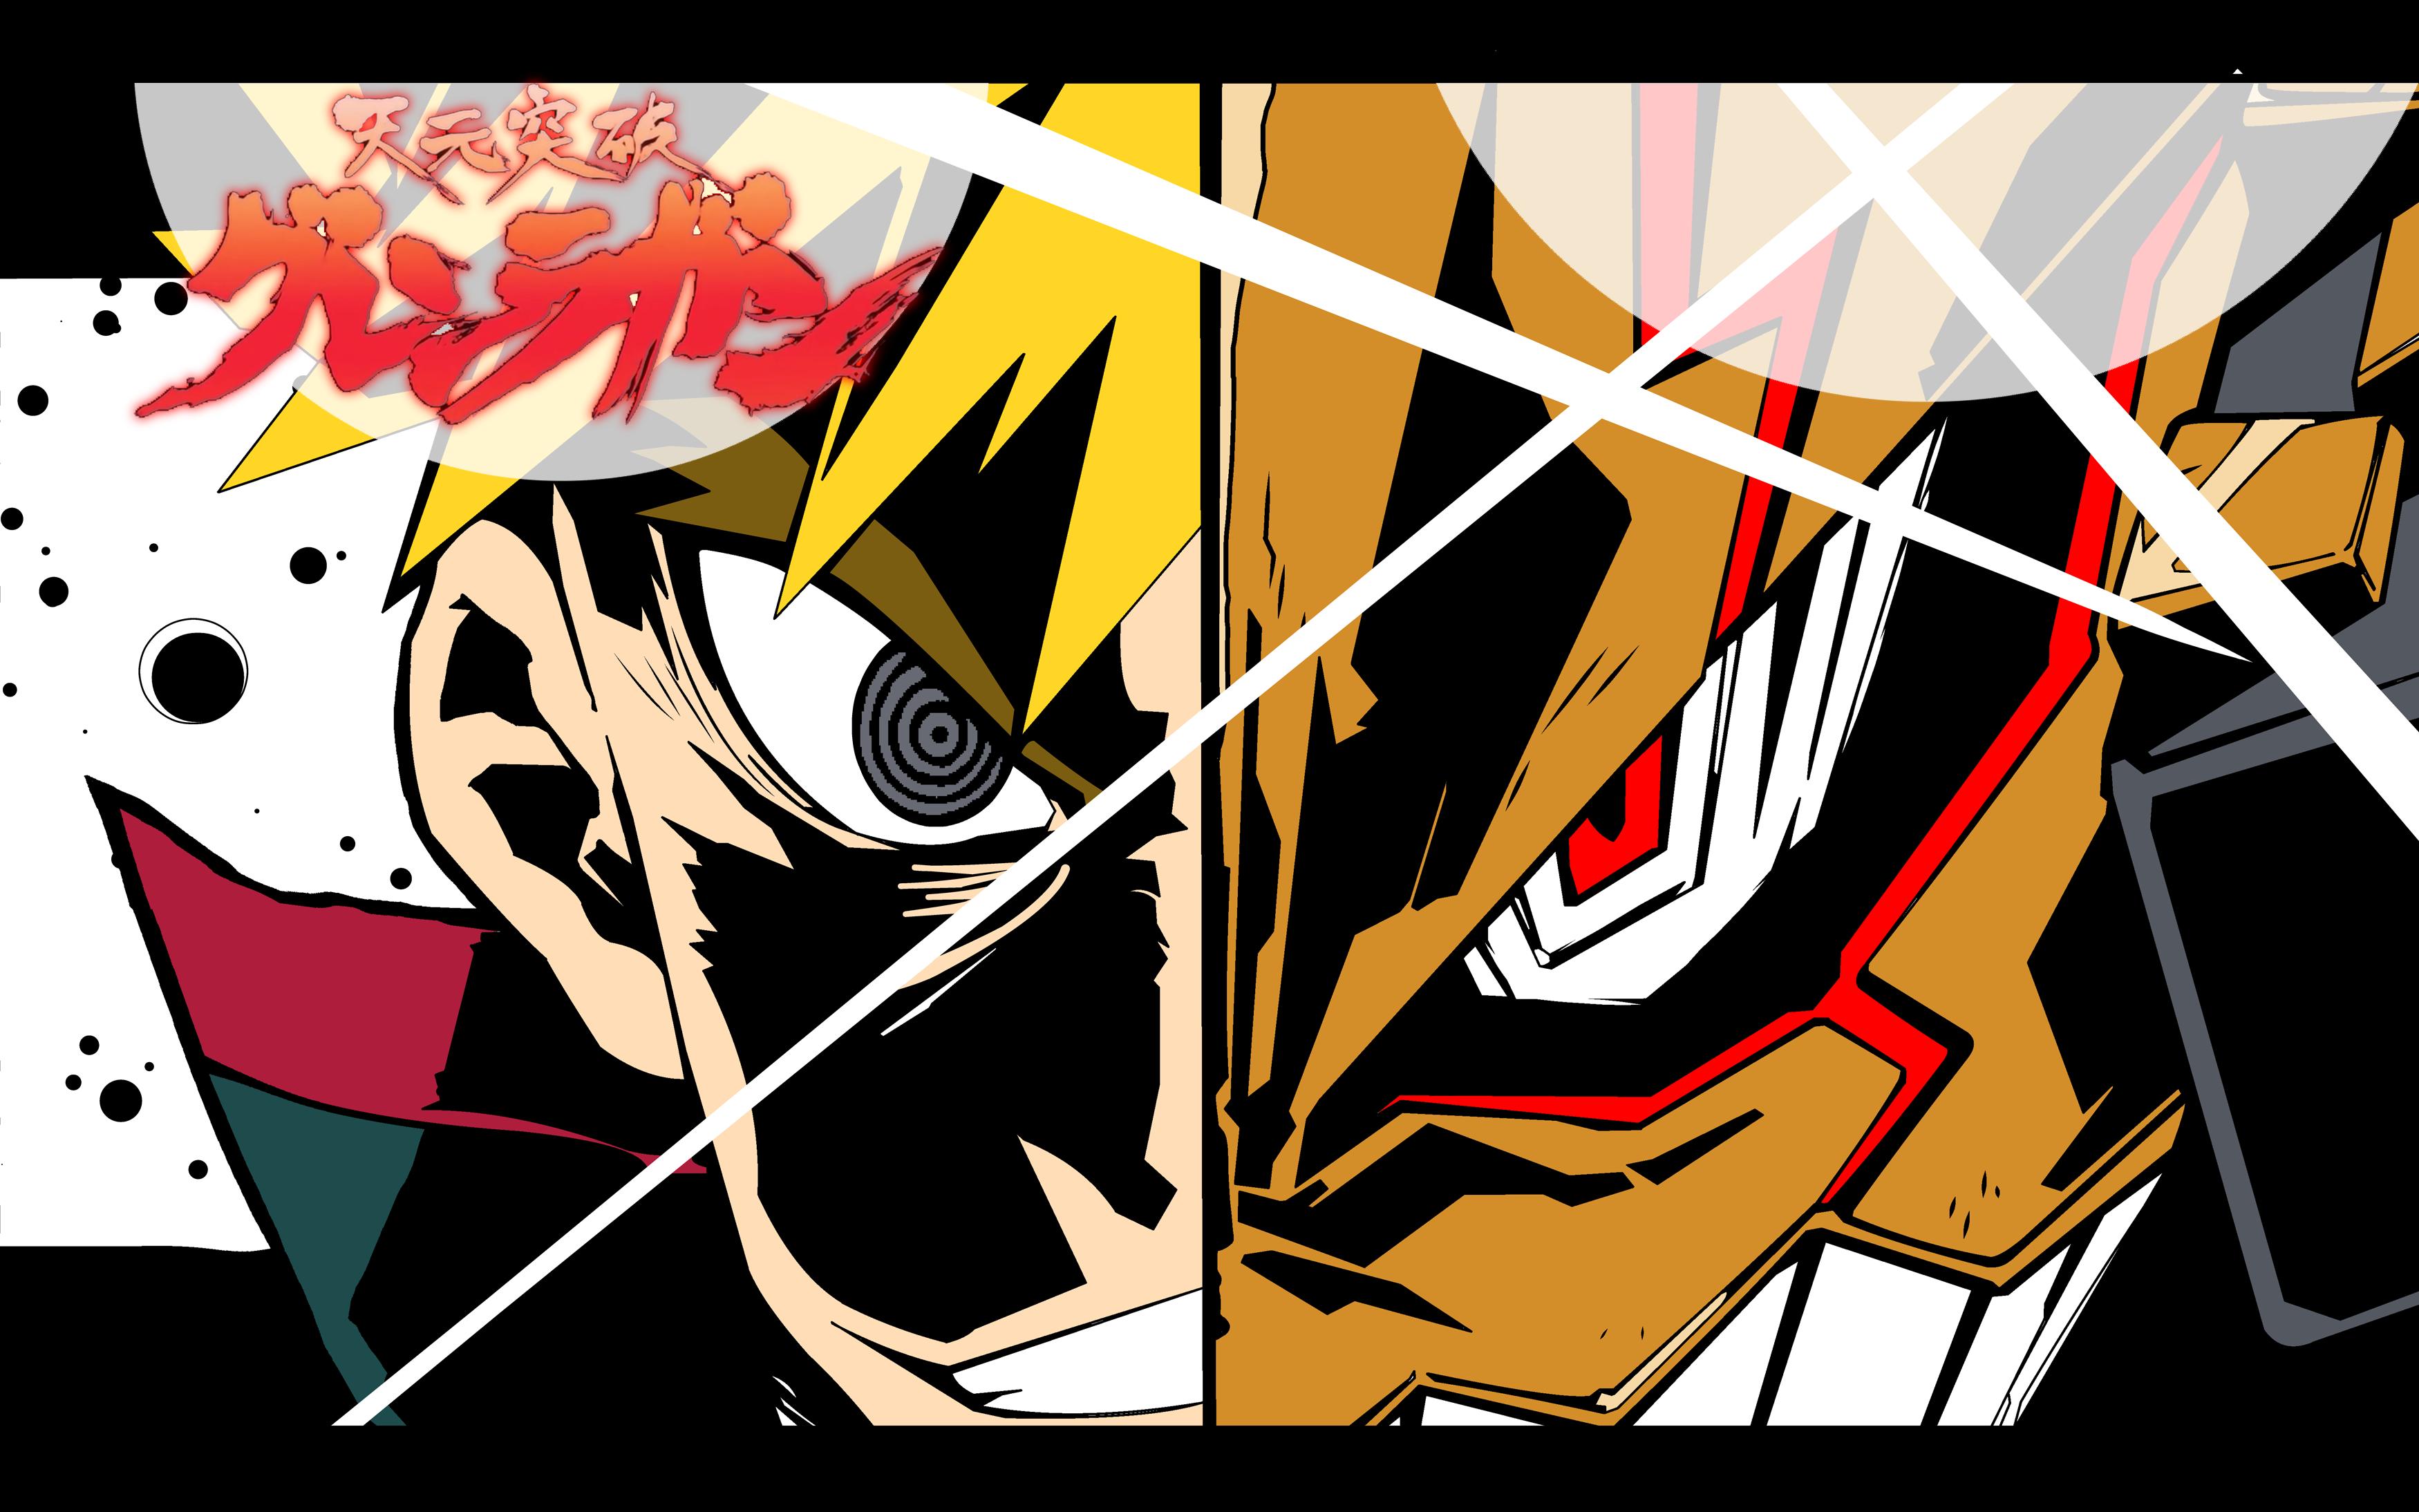 Pin By Desi Santana On Tengen Toppa Gurren Lagann Gurren Lagann Anime Canvas Anime